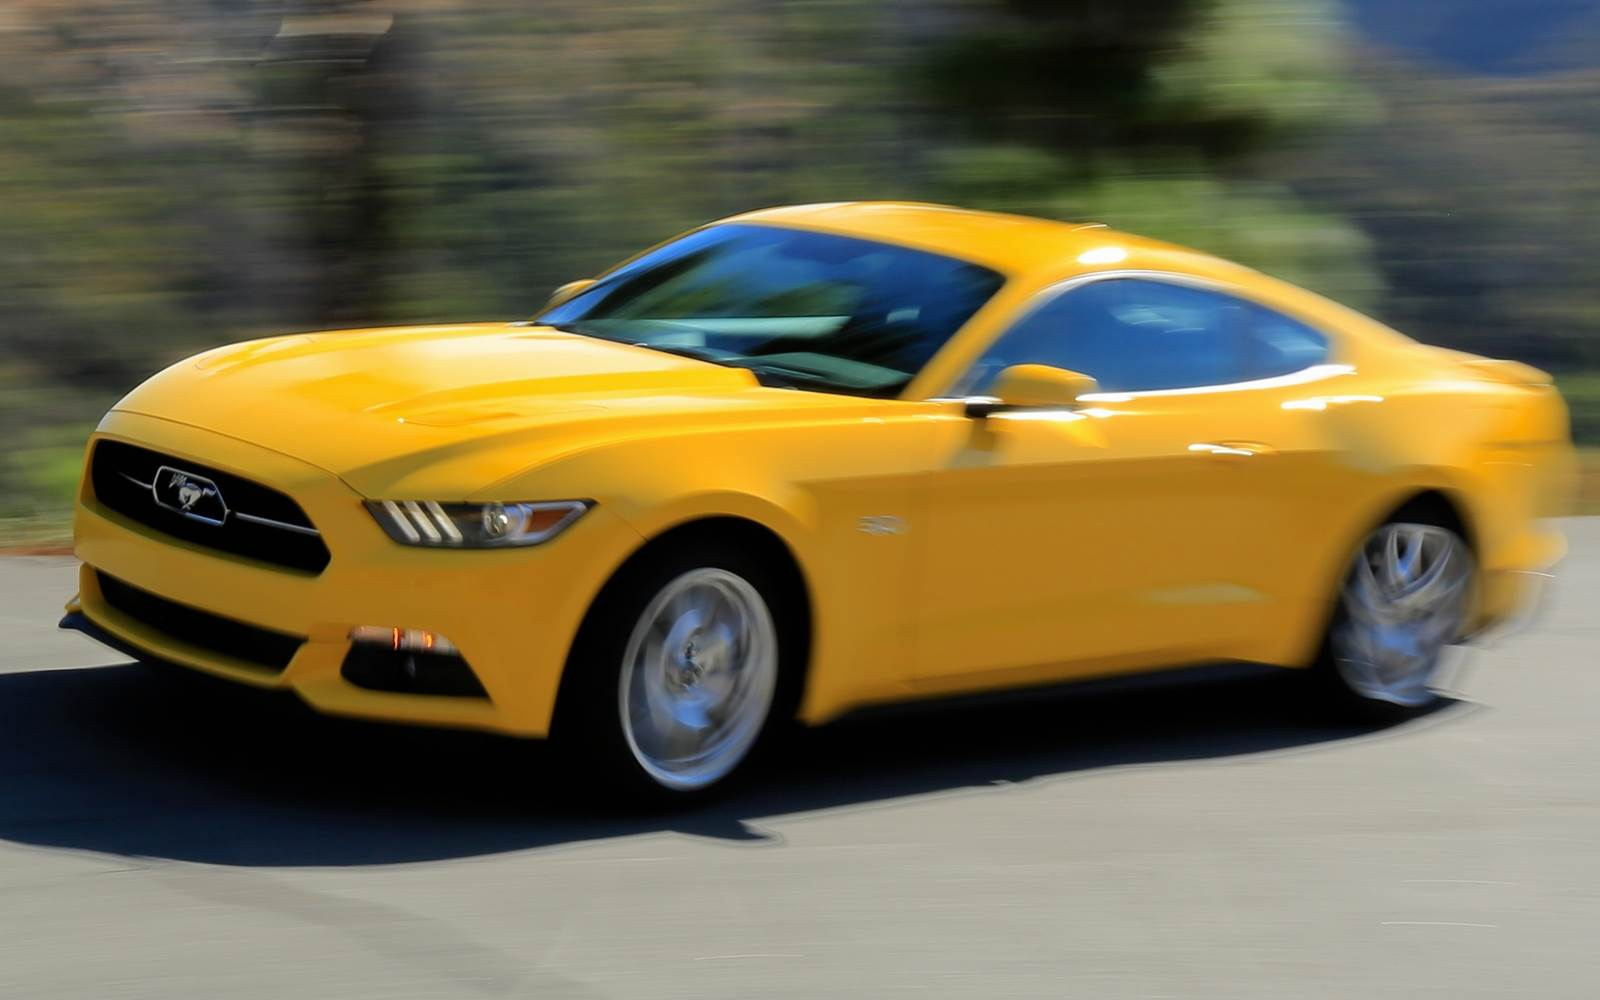 Novo Ford Mustang: no Brasil em 2016 - preço ~ R$ 270 mil ...